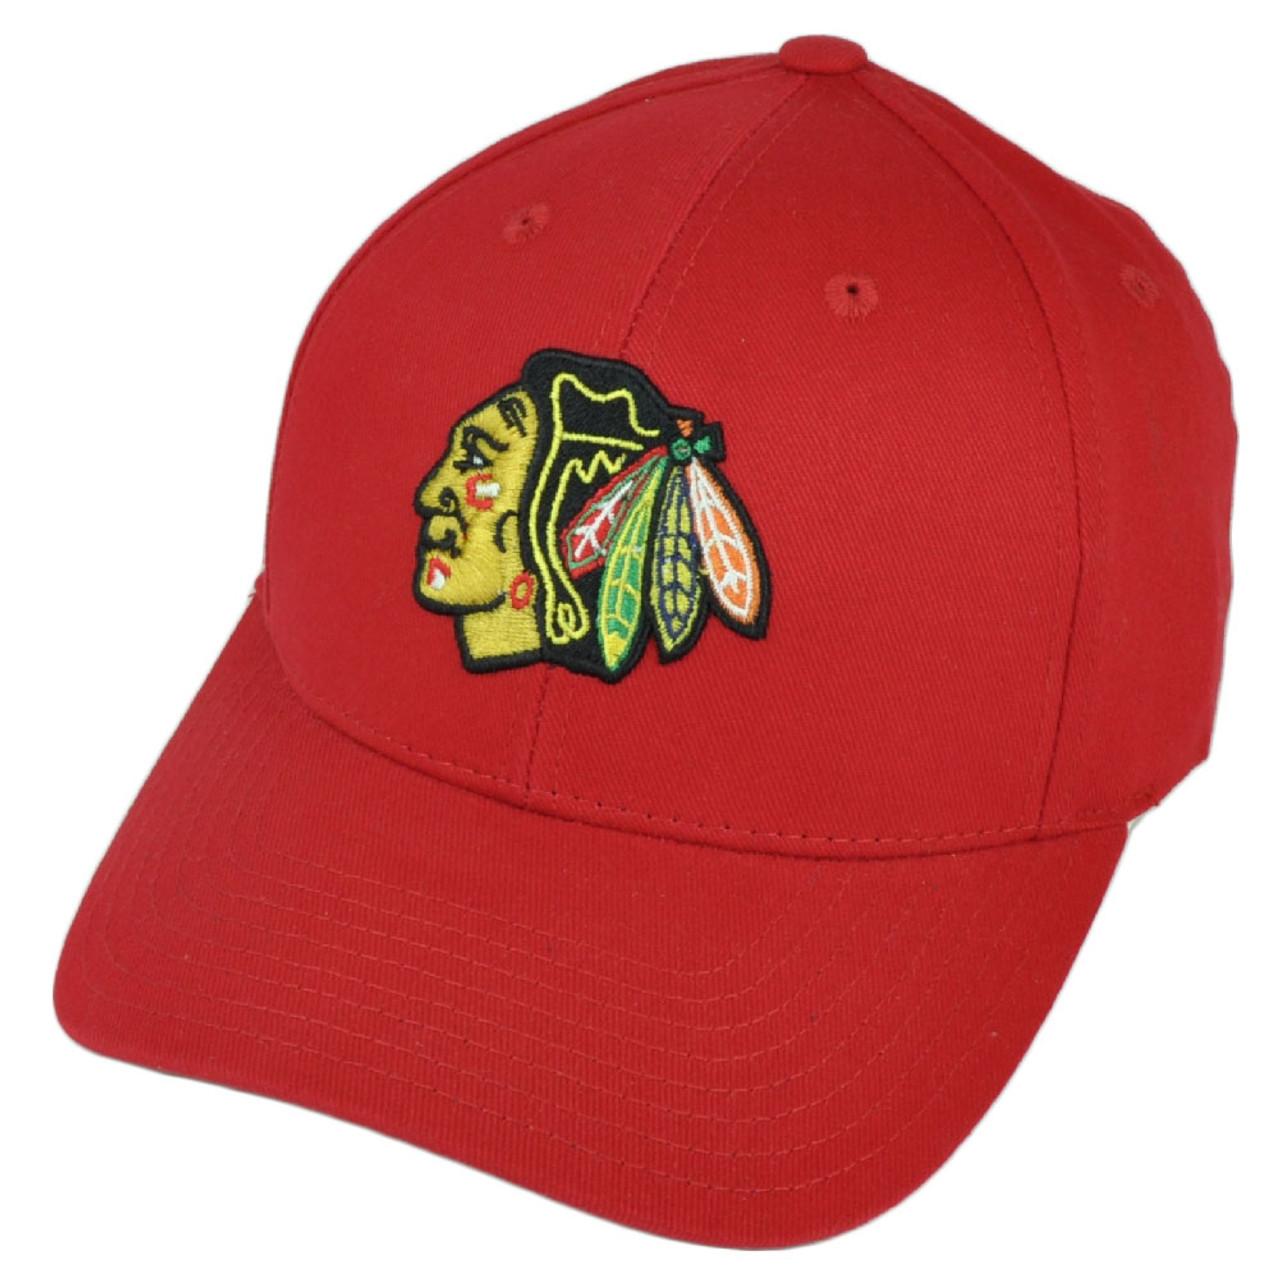 brand new 0b43c d3459 NHL American Needle Chicago Blackhawks Hat Cap Red Adjustable Headgear